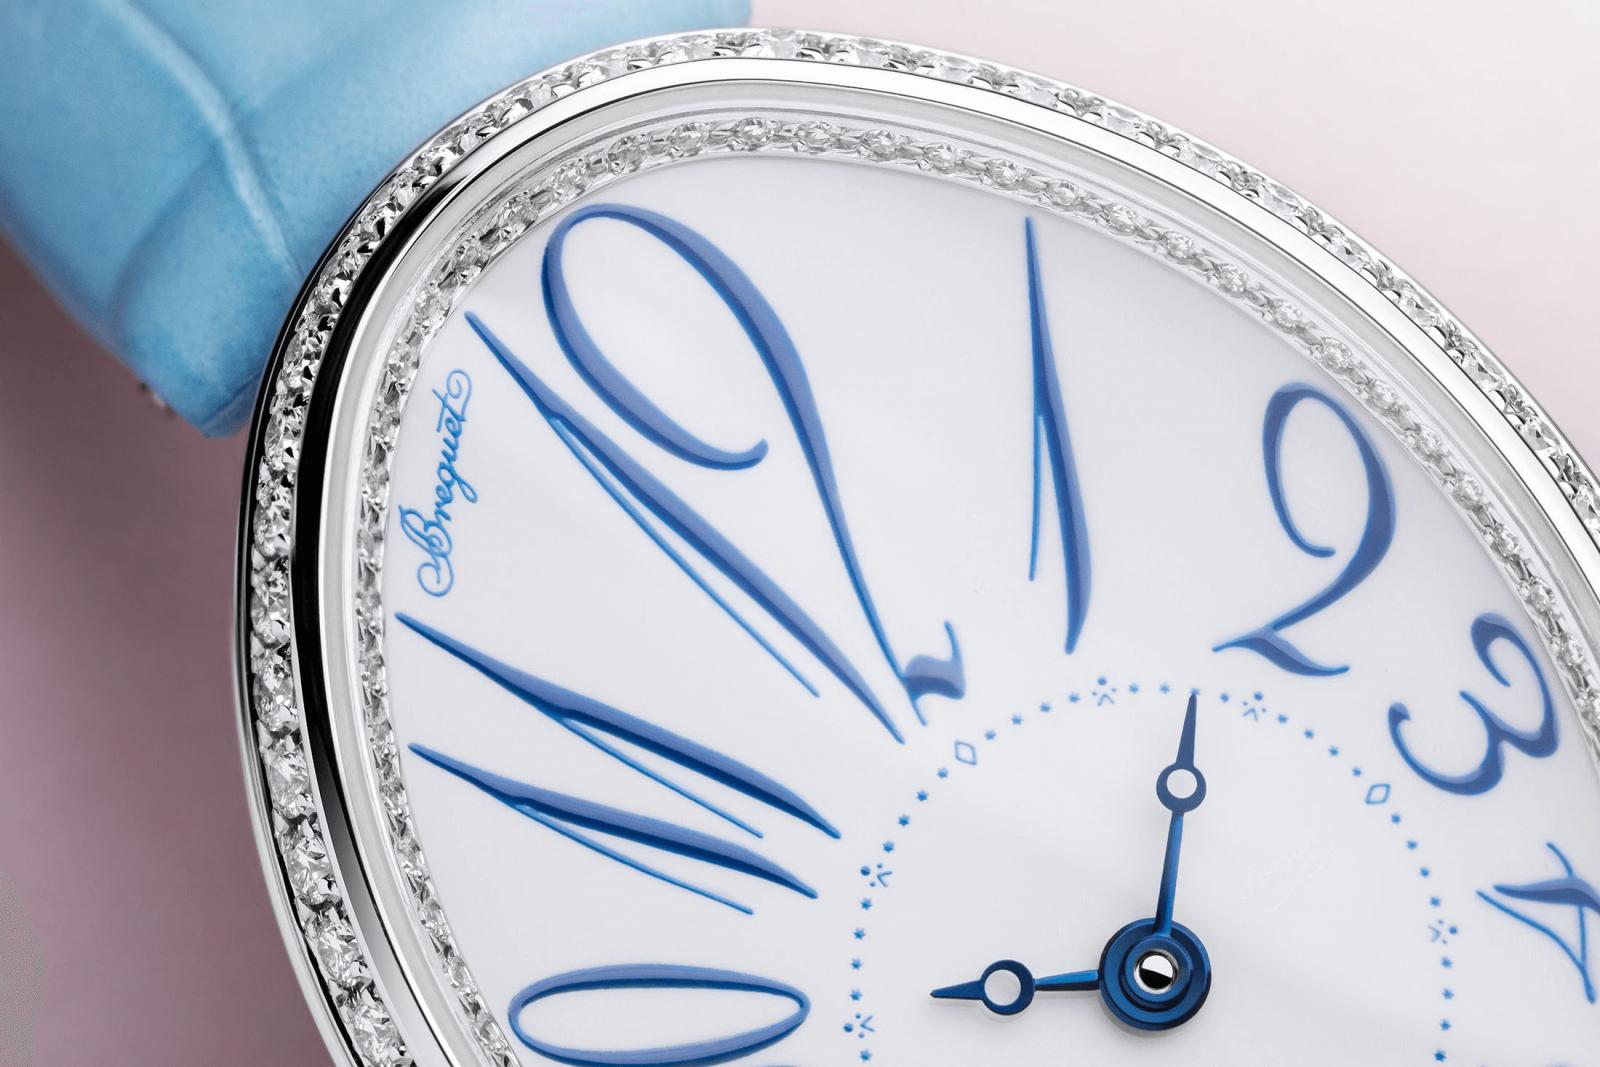 đồng hồ tráng men nữ breguet reine de naples 8198